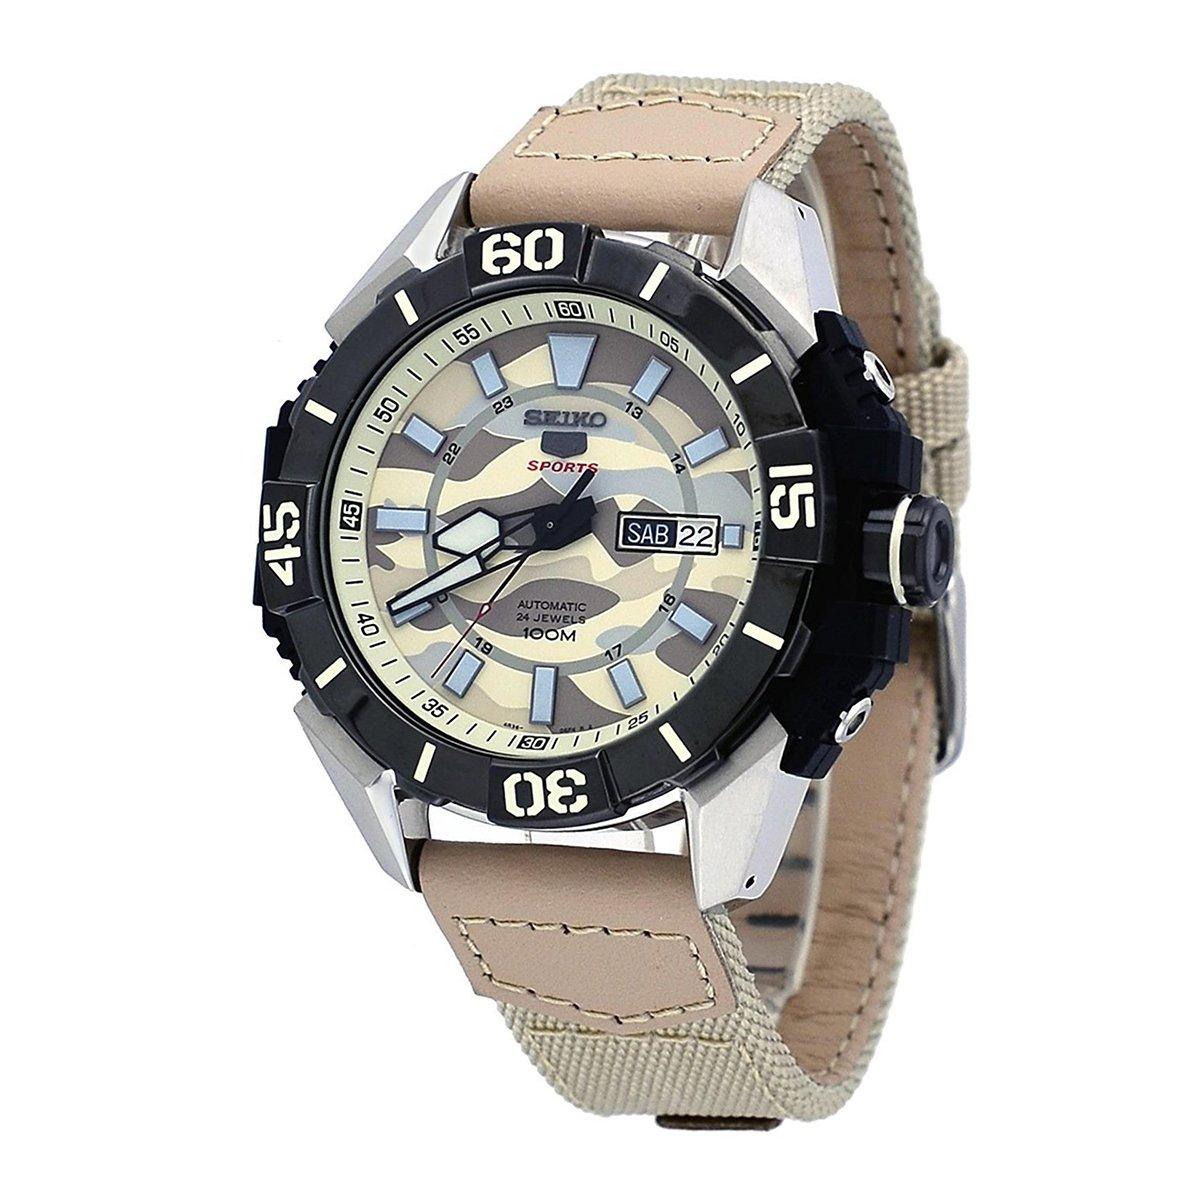 Часы Seiko 5 Sports SRPA01J1 Automatic 4R36